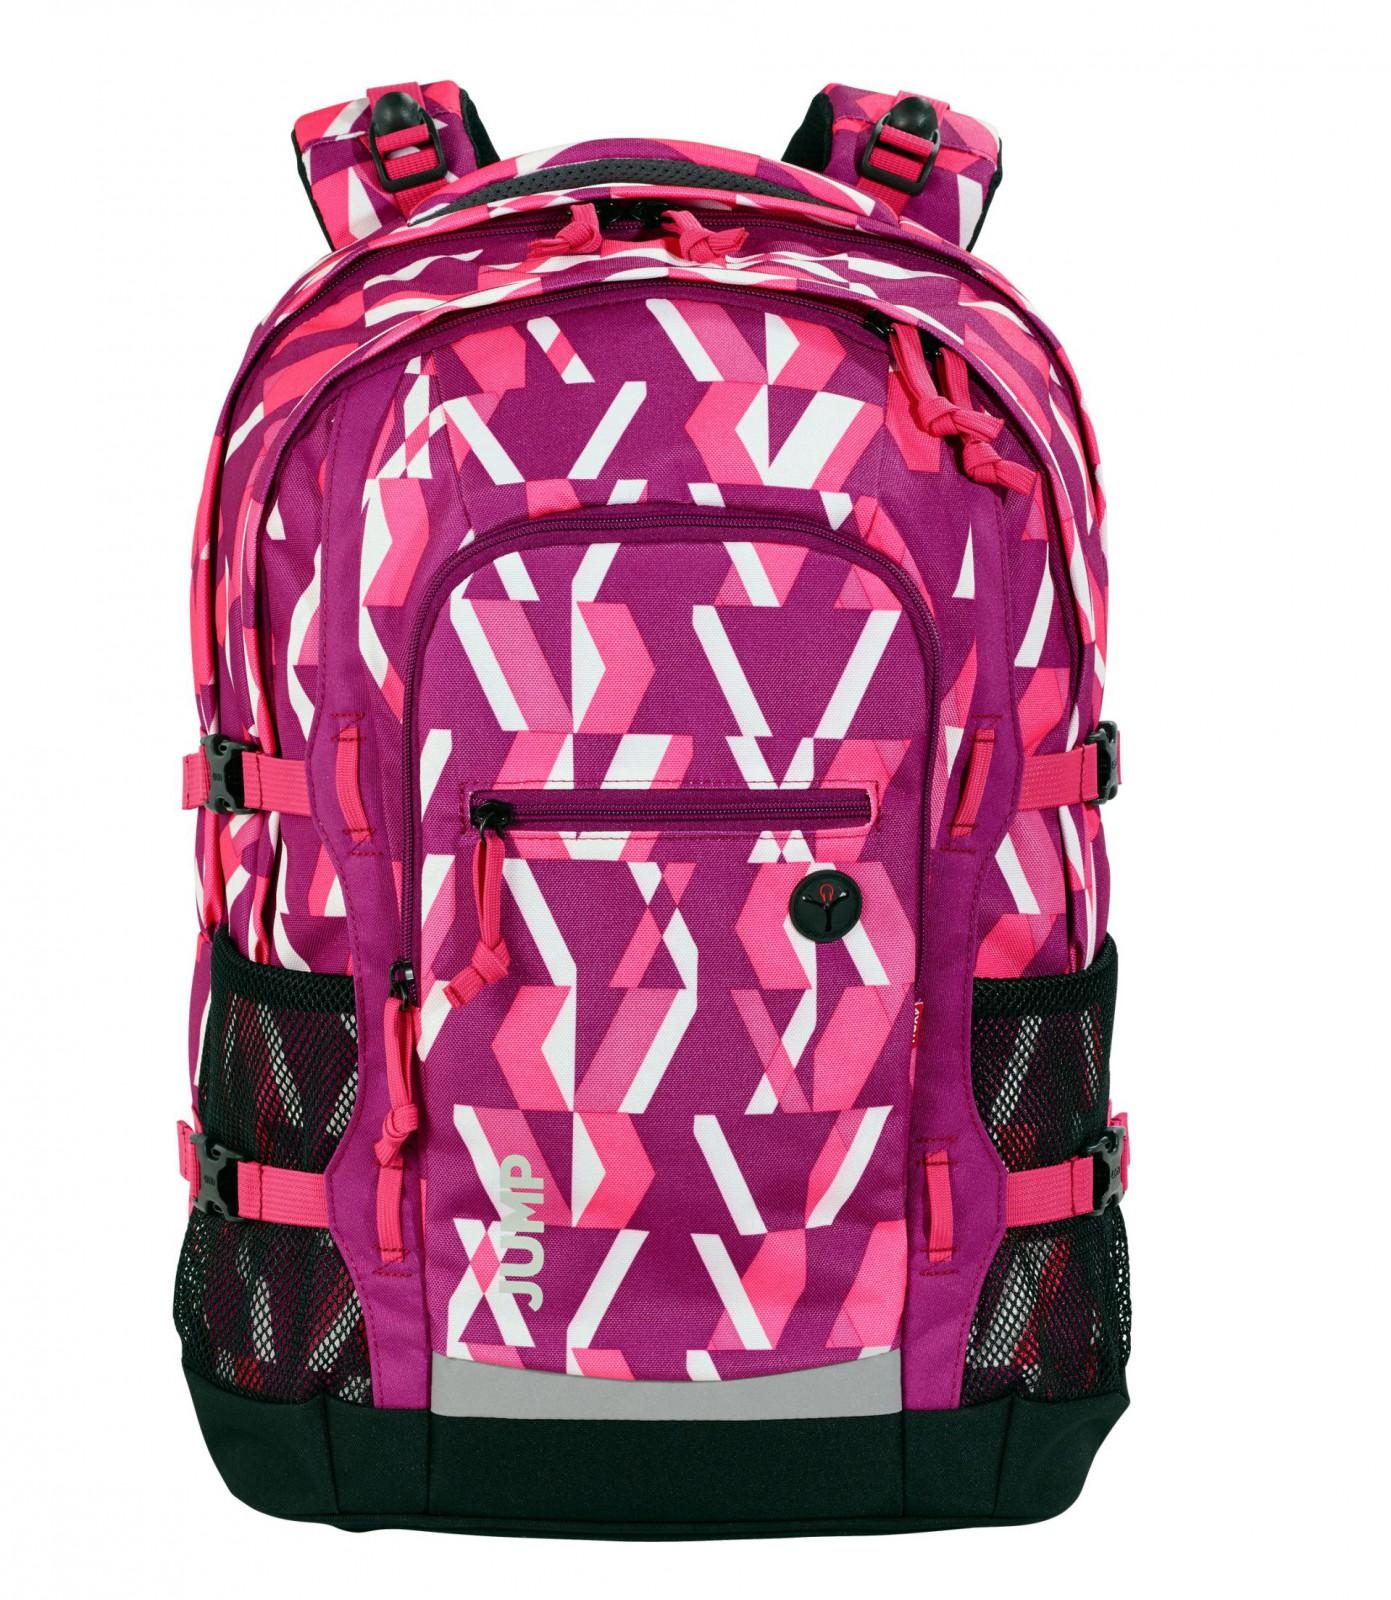 4you rucksack jump schulrucksack chequer pink. Black Bedroom Furniture Sets. Home Design Ideas